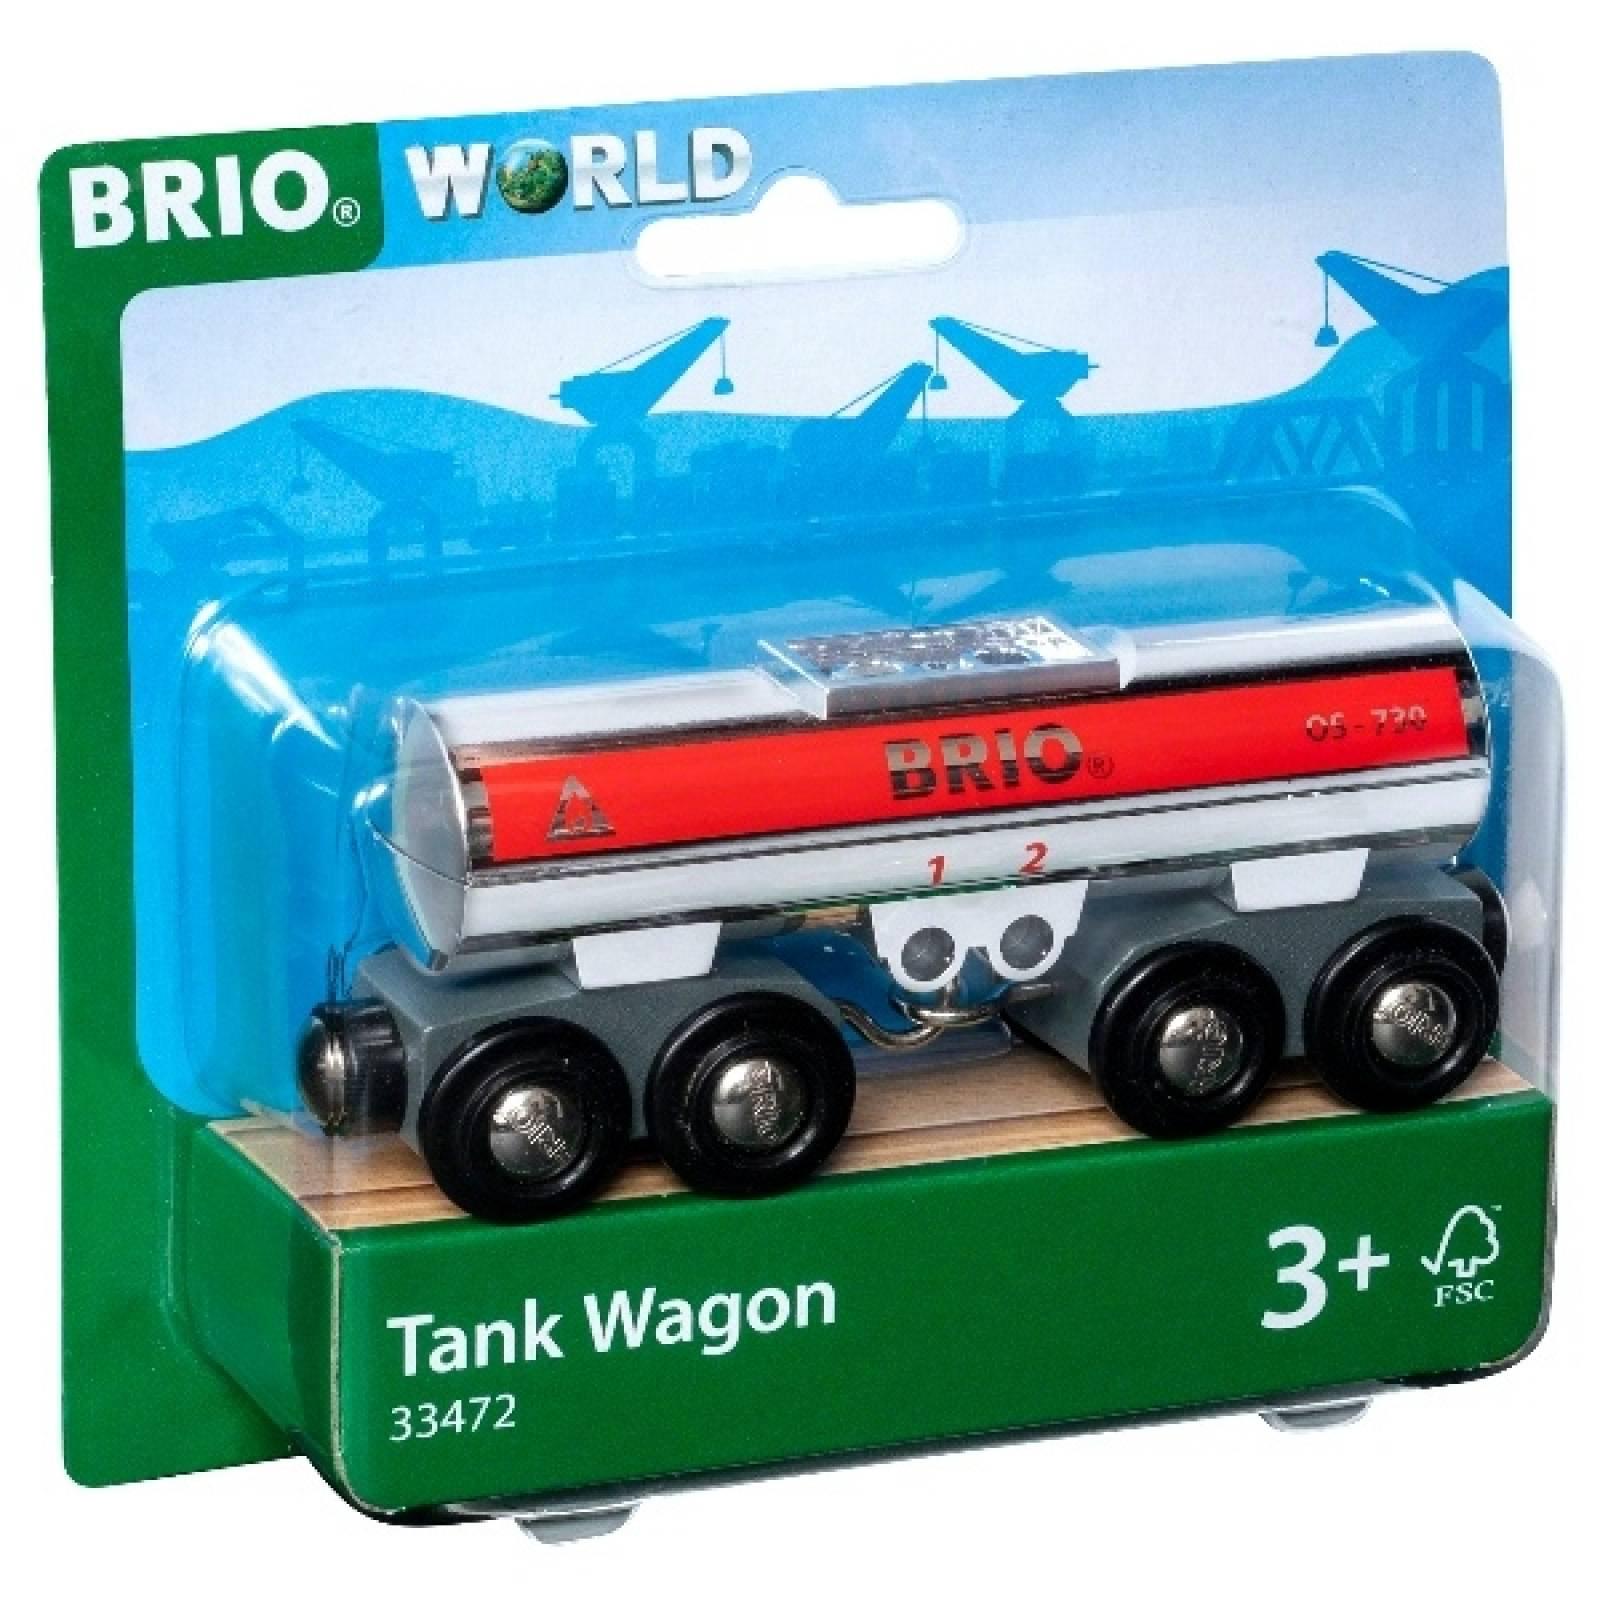 Tank Wagon Carriage BRIO Wooden Railway